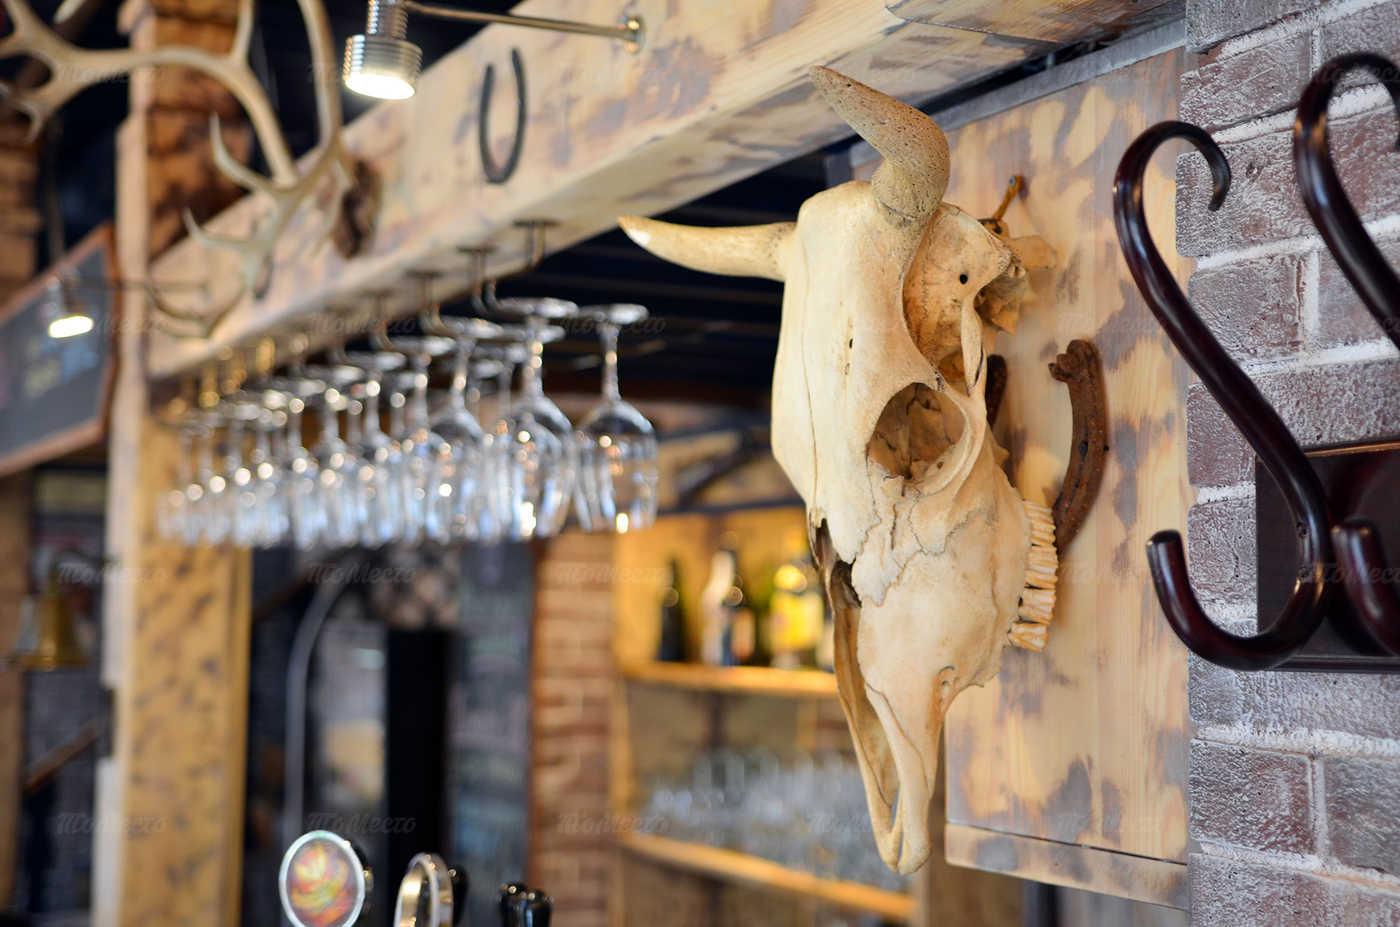 Ресторан Монтана (Montana saloon) на Кирочной улице фото 20